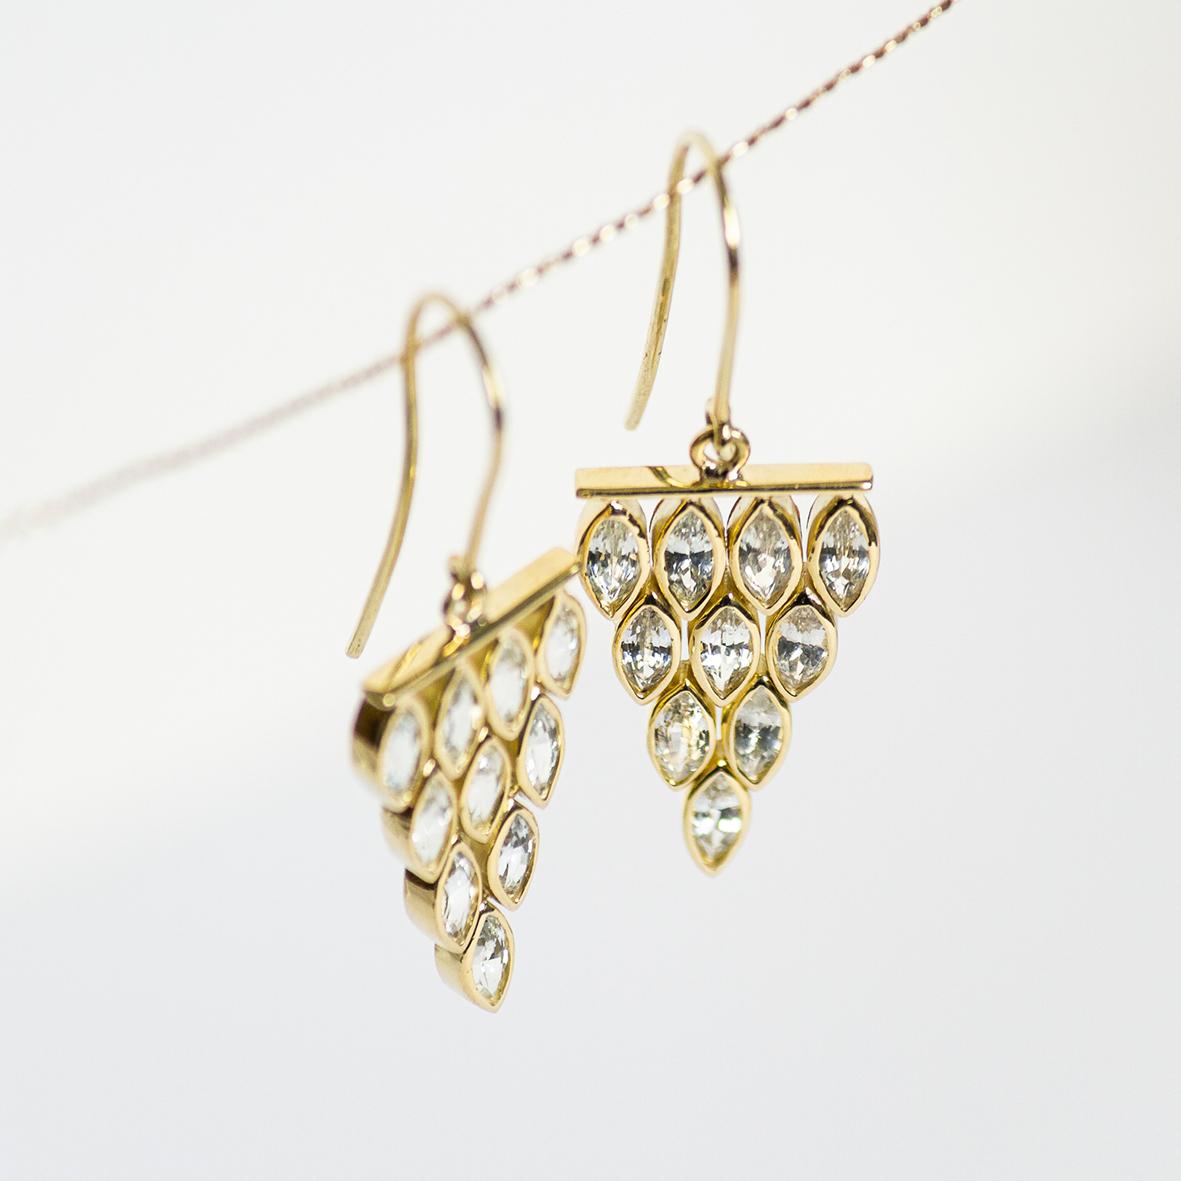 2. OONA_philo_principal_cascade marquise sapphire earrings